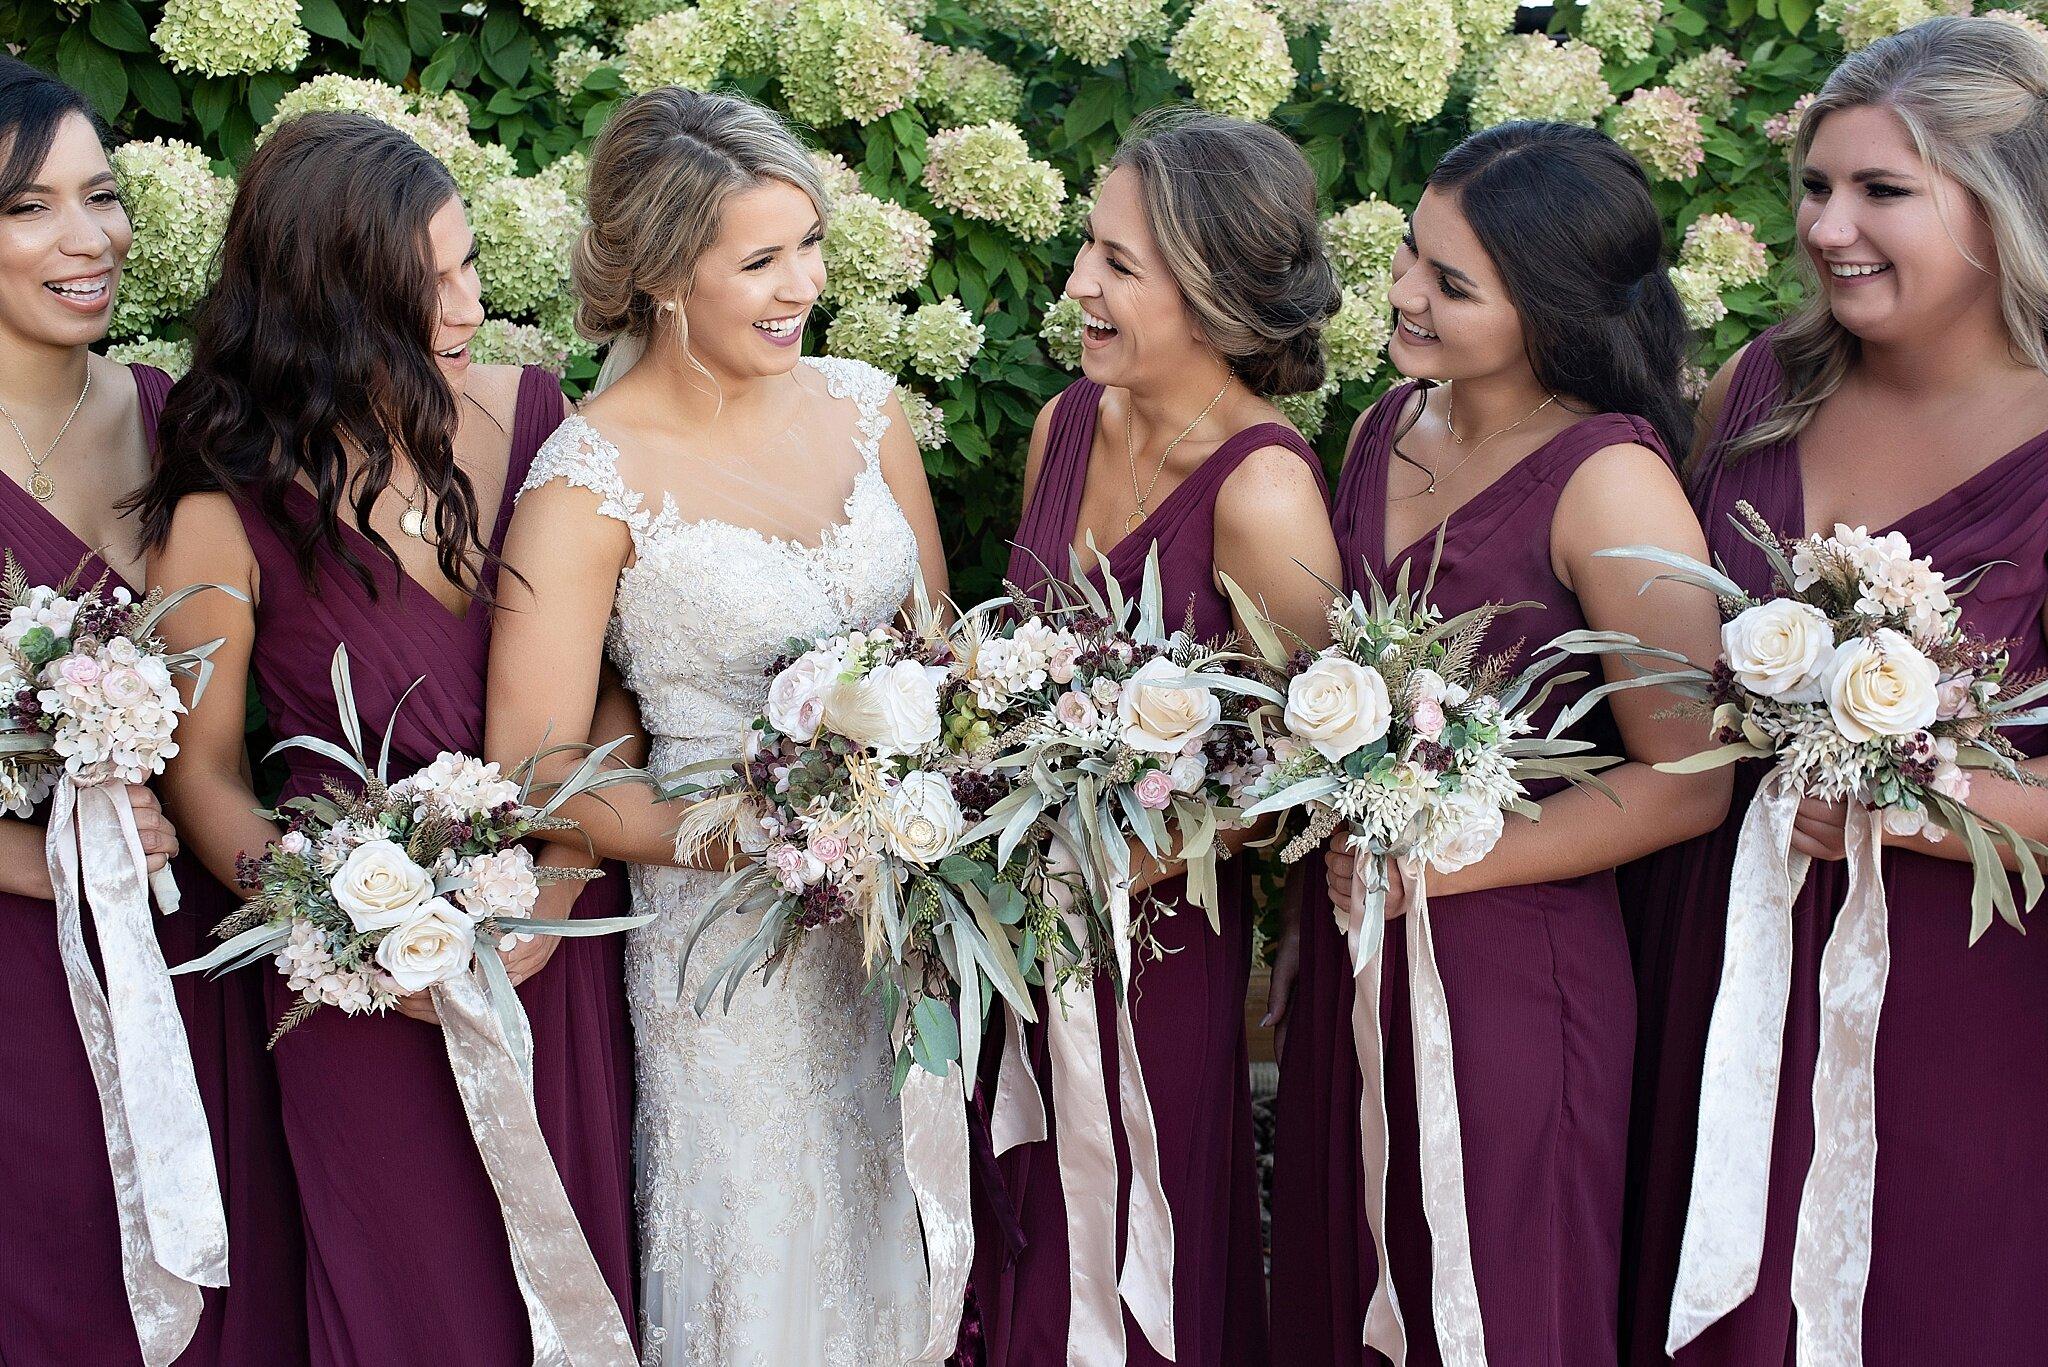 burgundy sleeveless bridesmaid dress flowy lace wedding gown